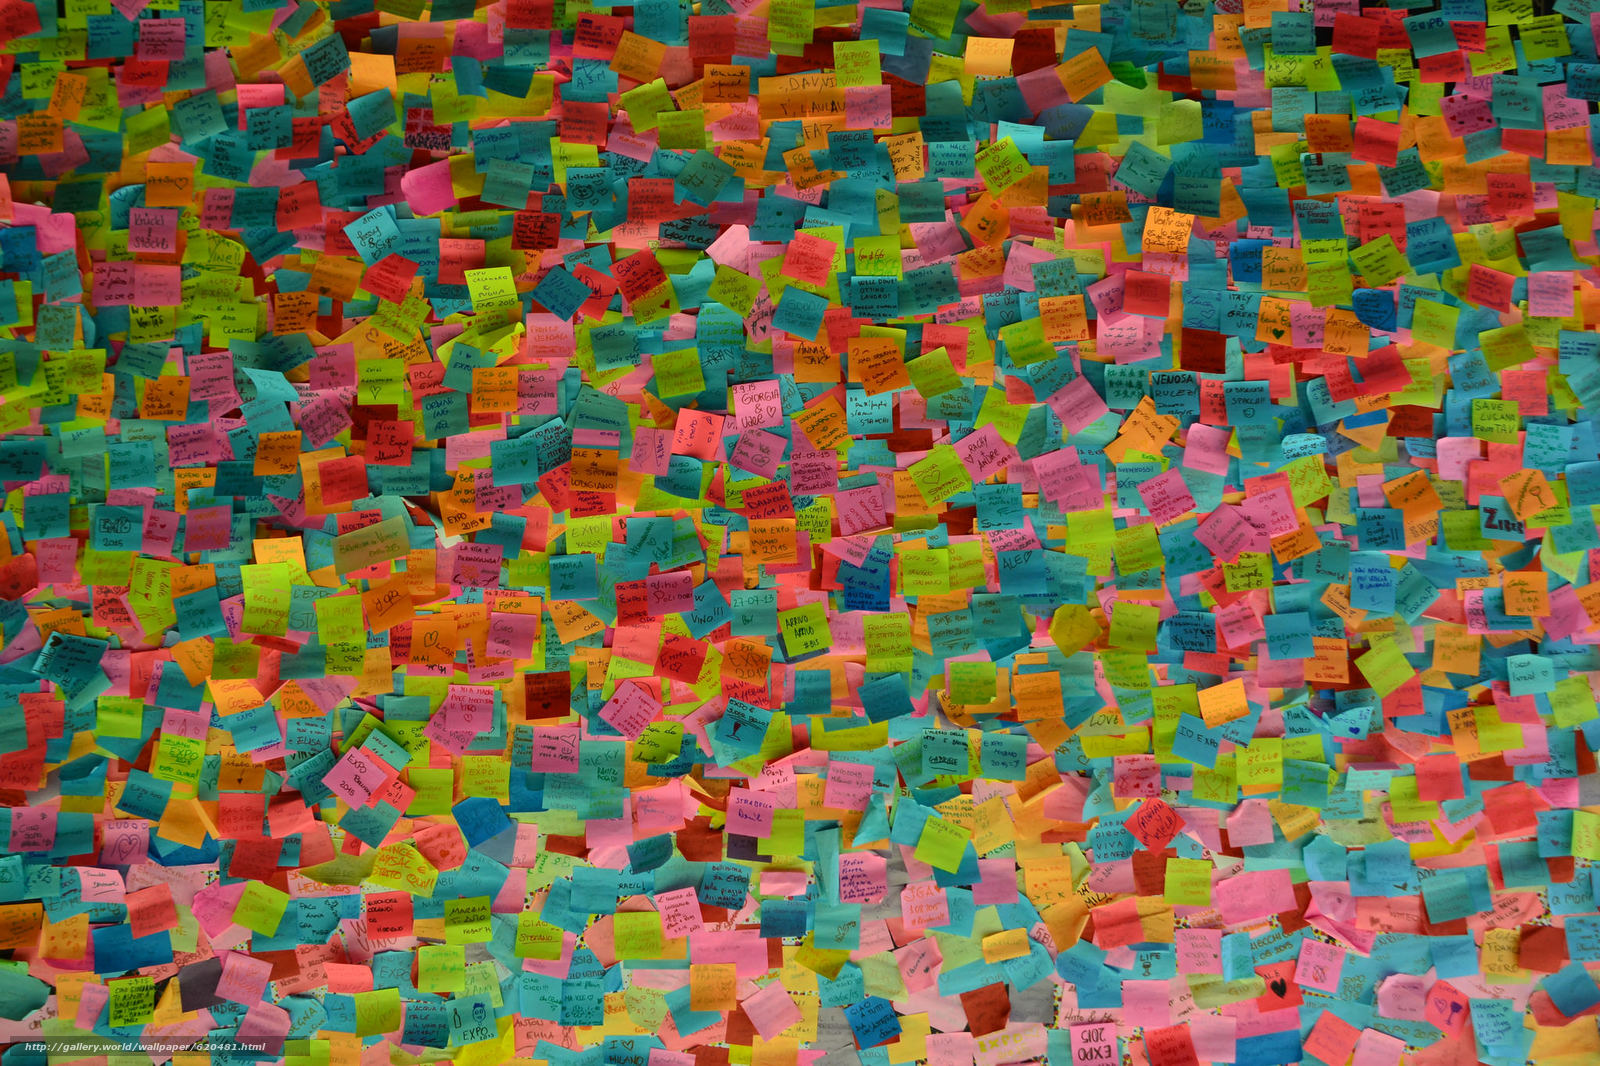 Scrapbook paper as wallpaper - Download Wallpaper Paper Leaves Scrapbook Notes Free Desktop Wallpaper In The Resolution 2048x1365 Picture 620481